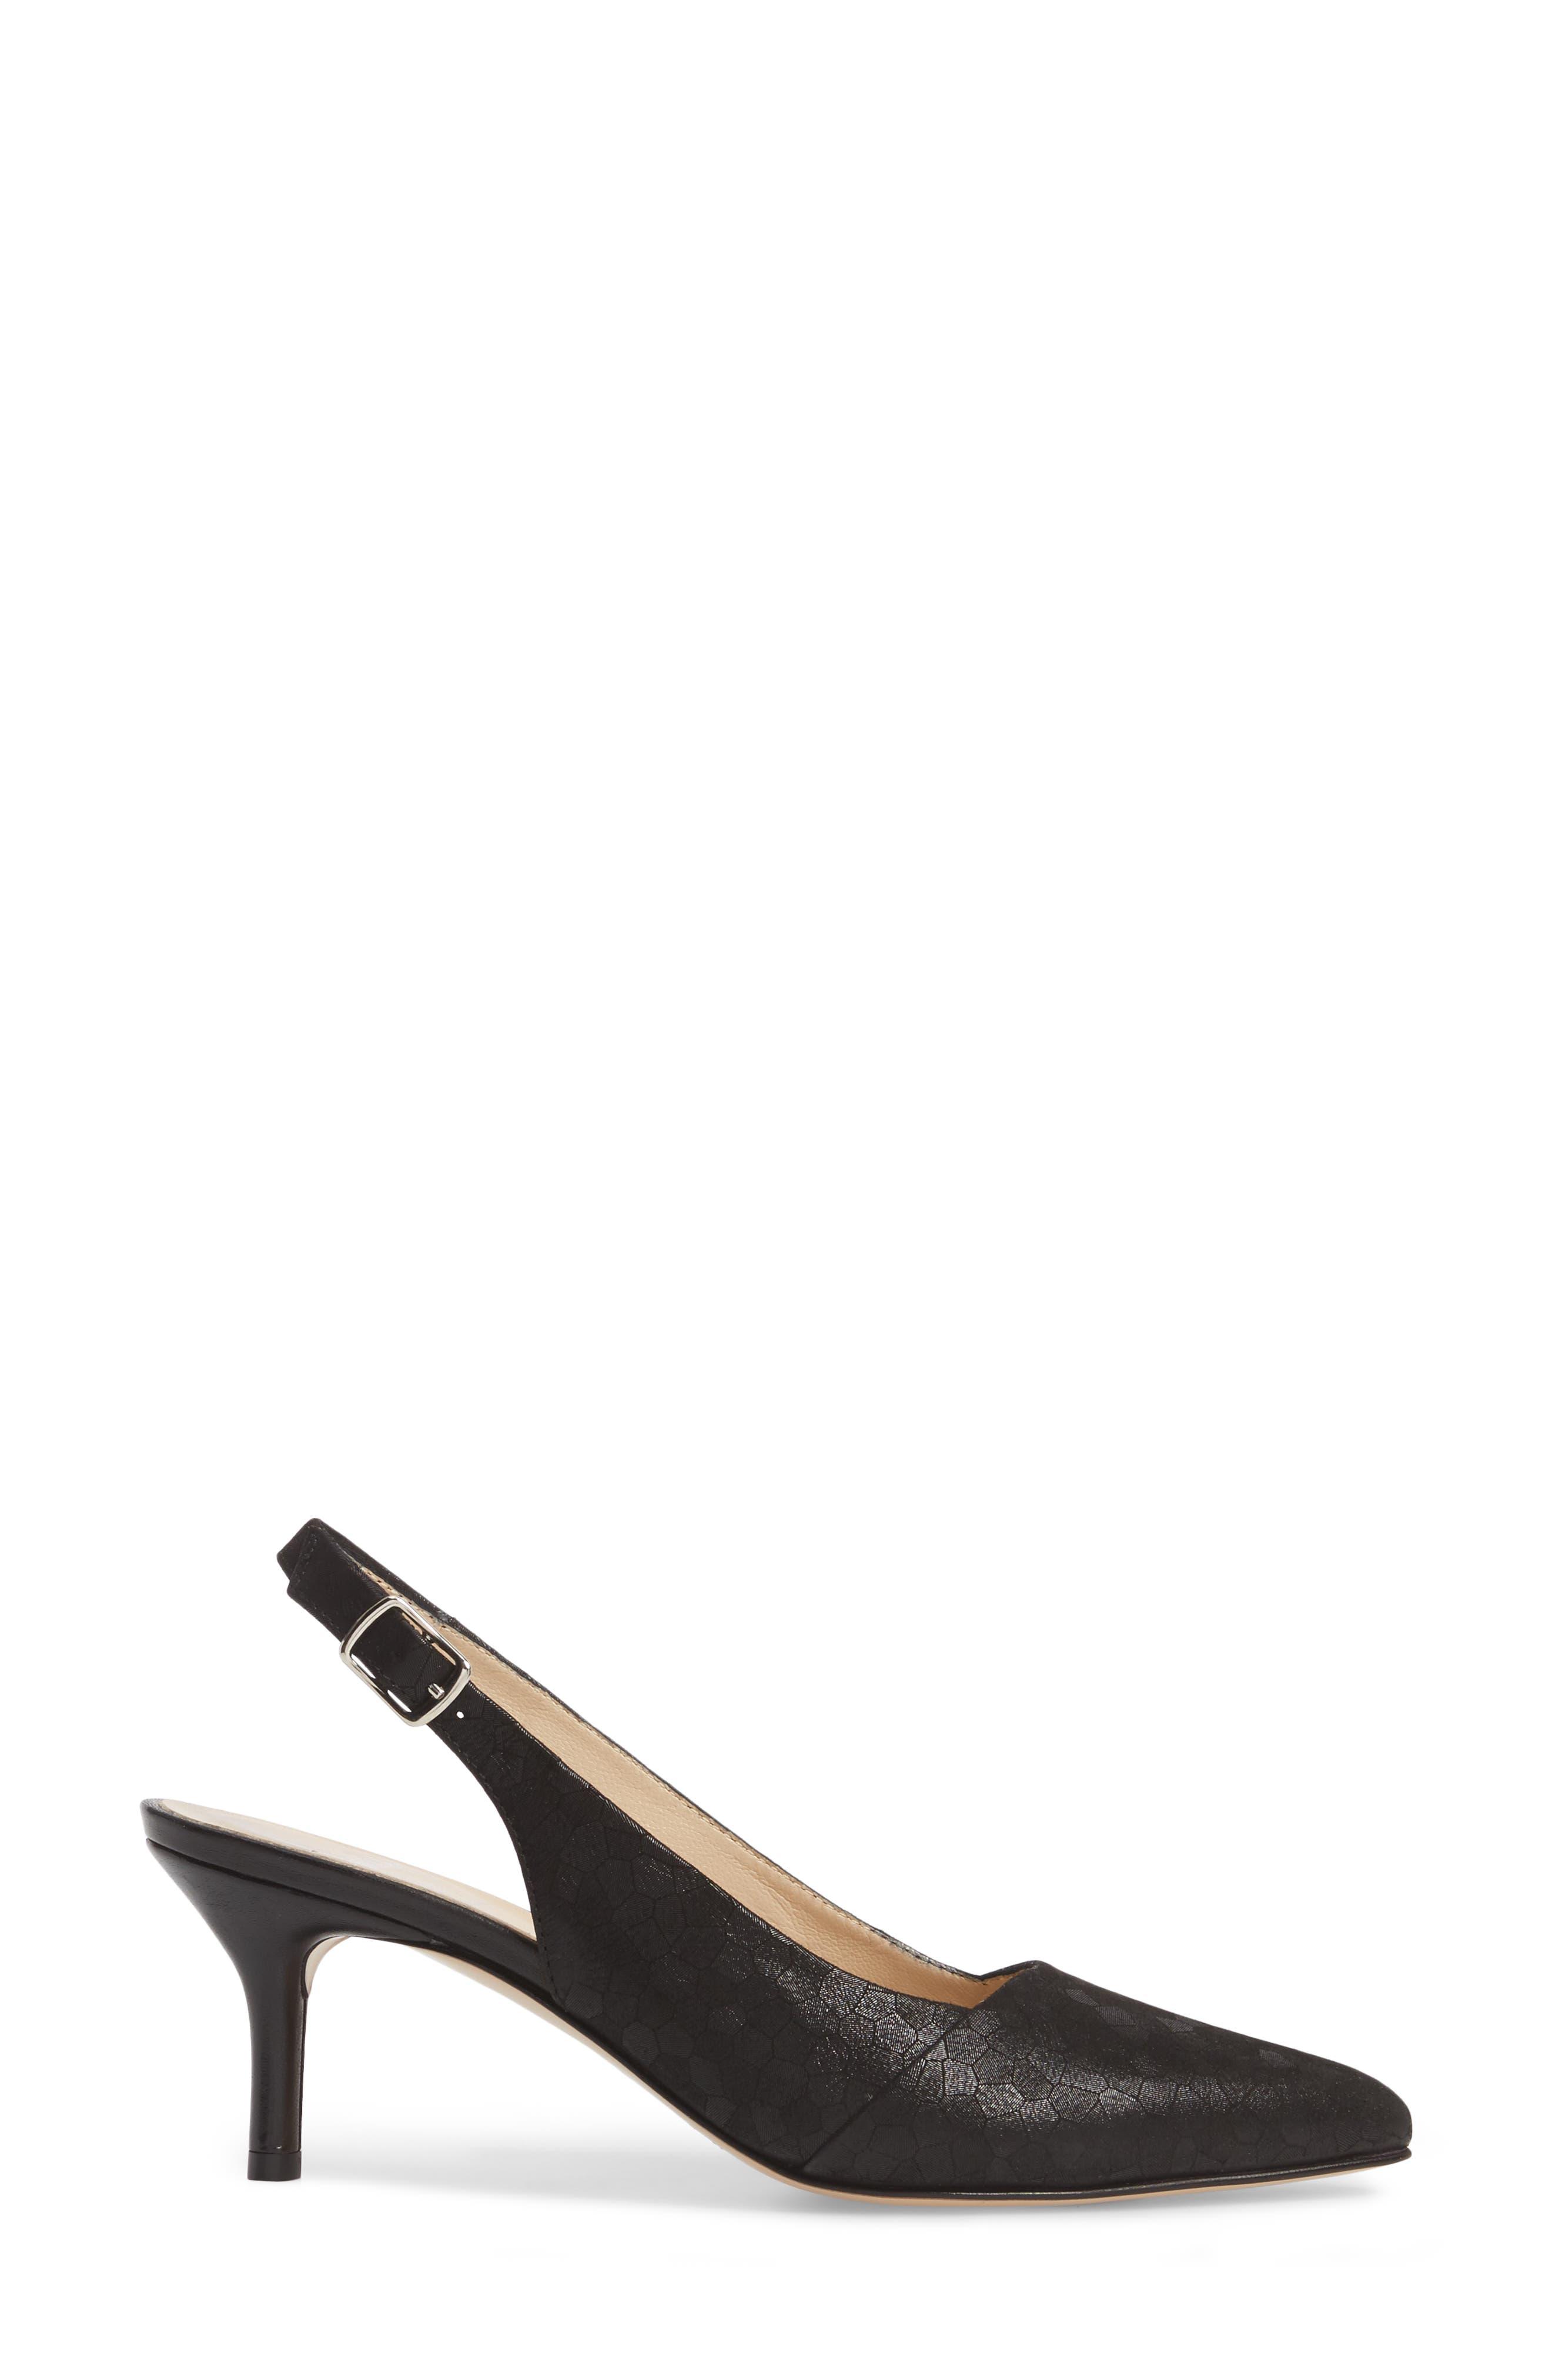 Parigi Slingback Pump,                             Alternate thumbnail 3, color,                             Black Leather